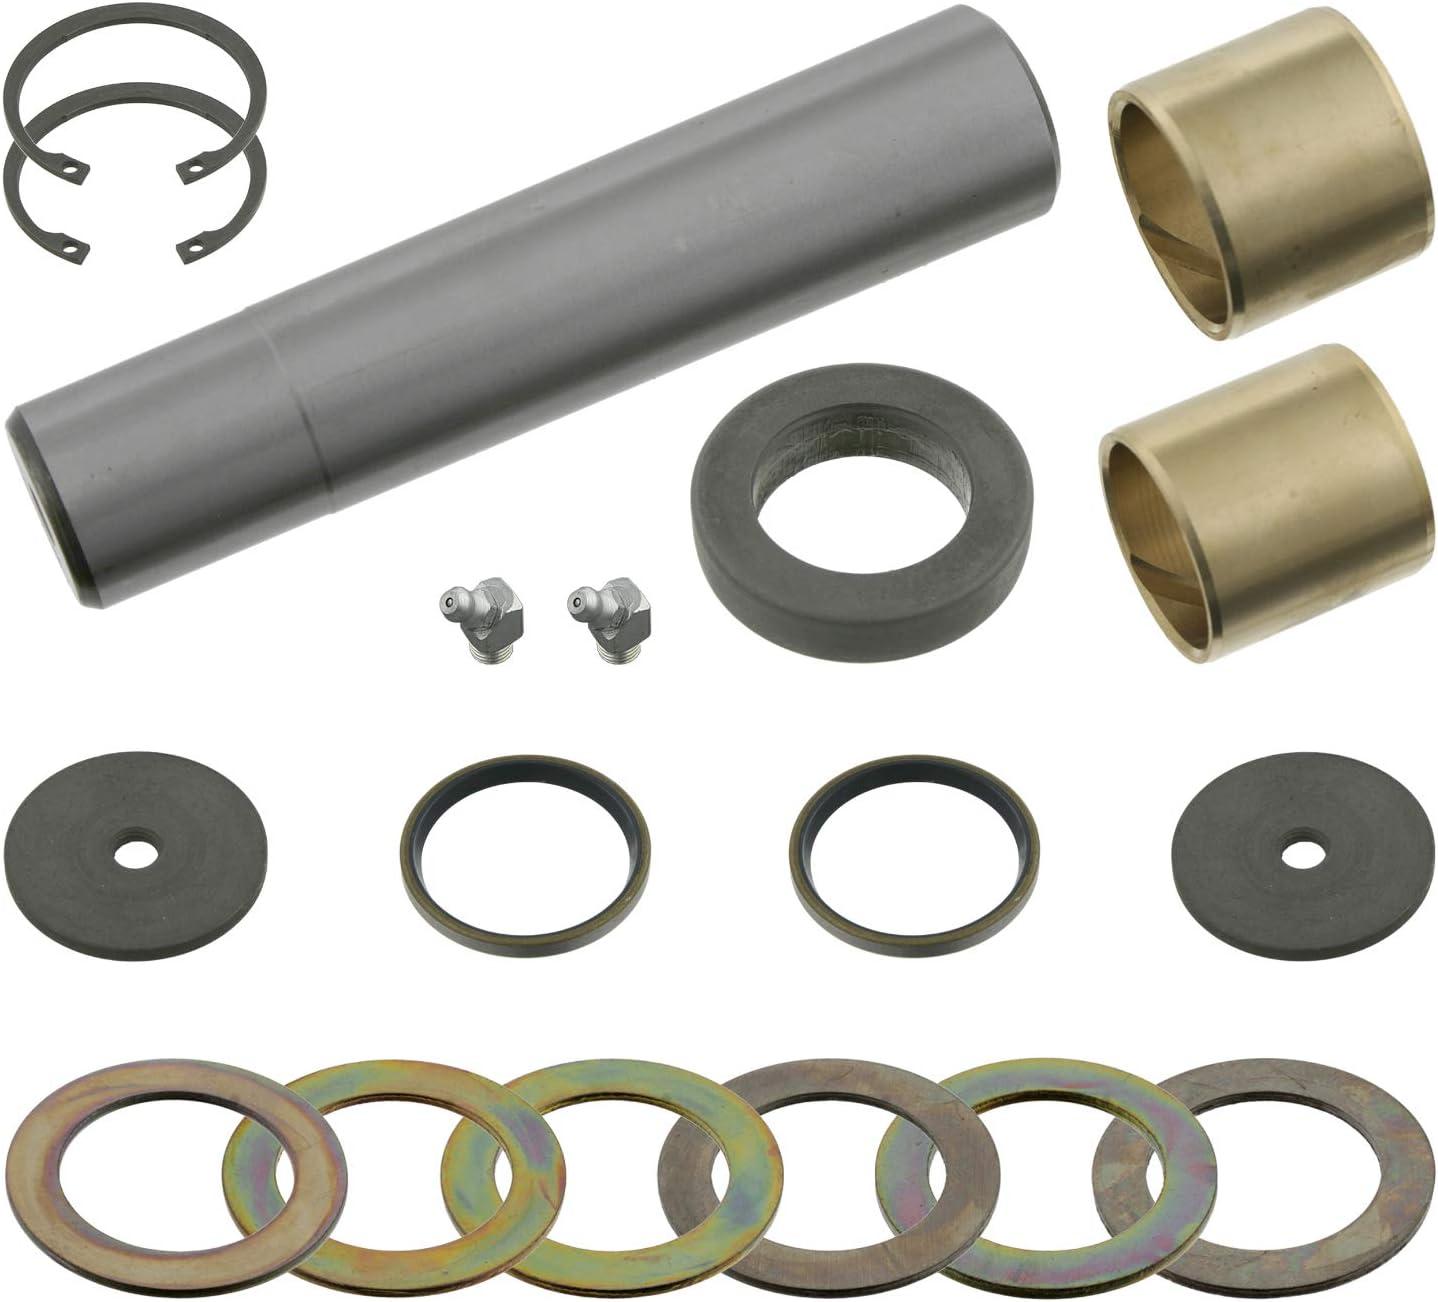 febi bilstein Free shipping on posting reviews 08420 Cash special price king pin thrust bearing single set with